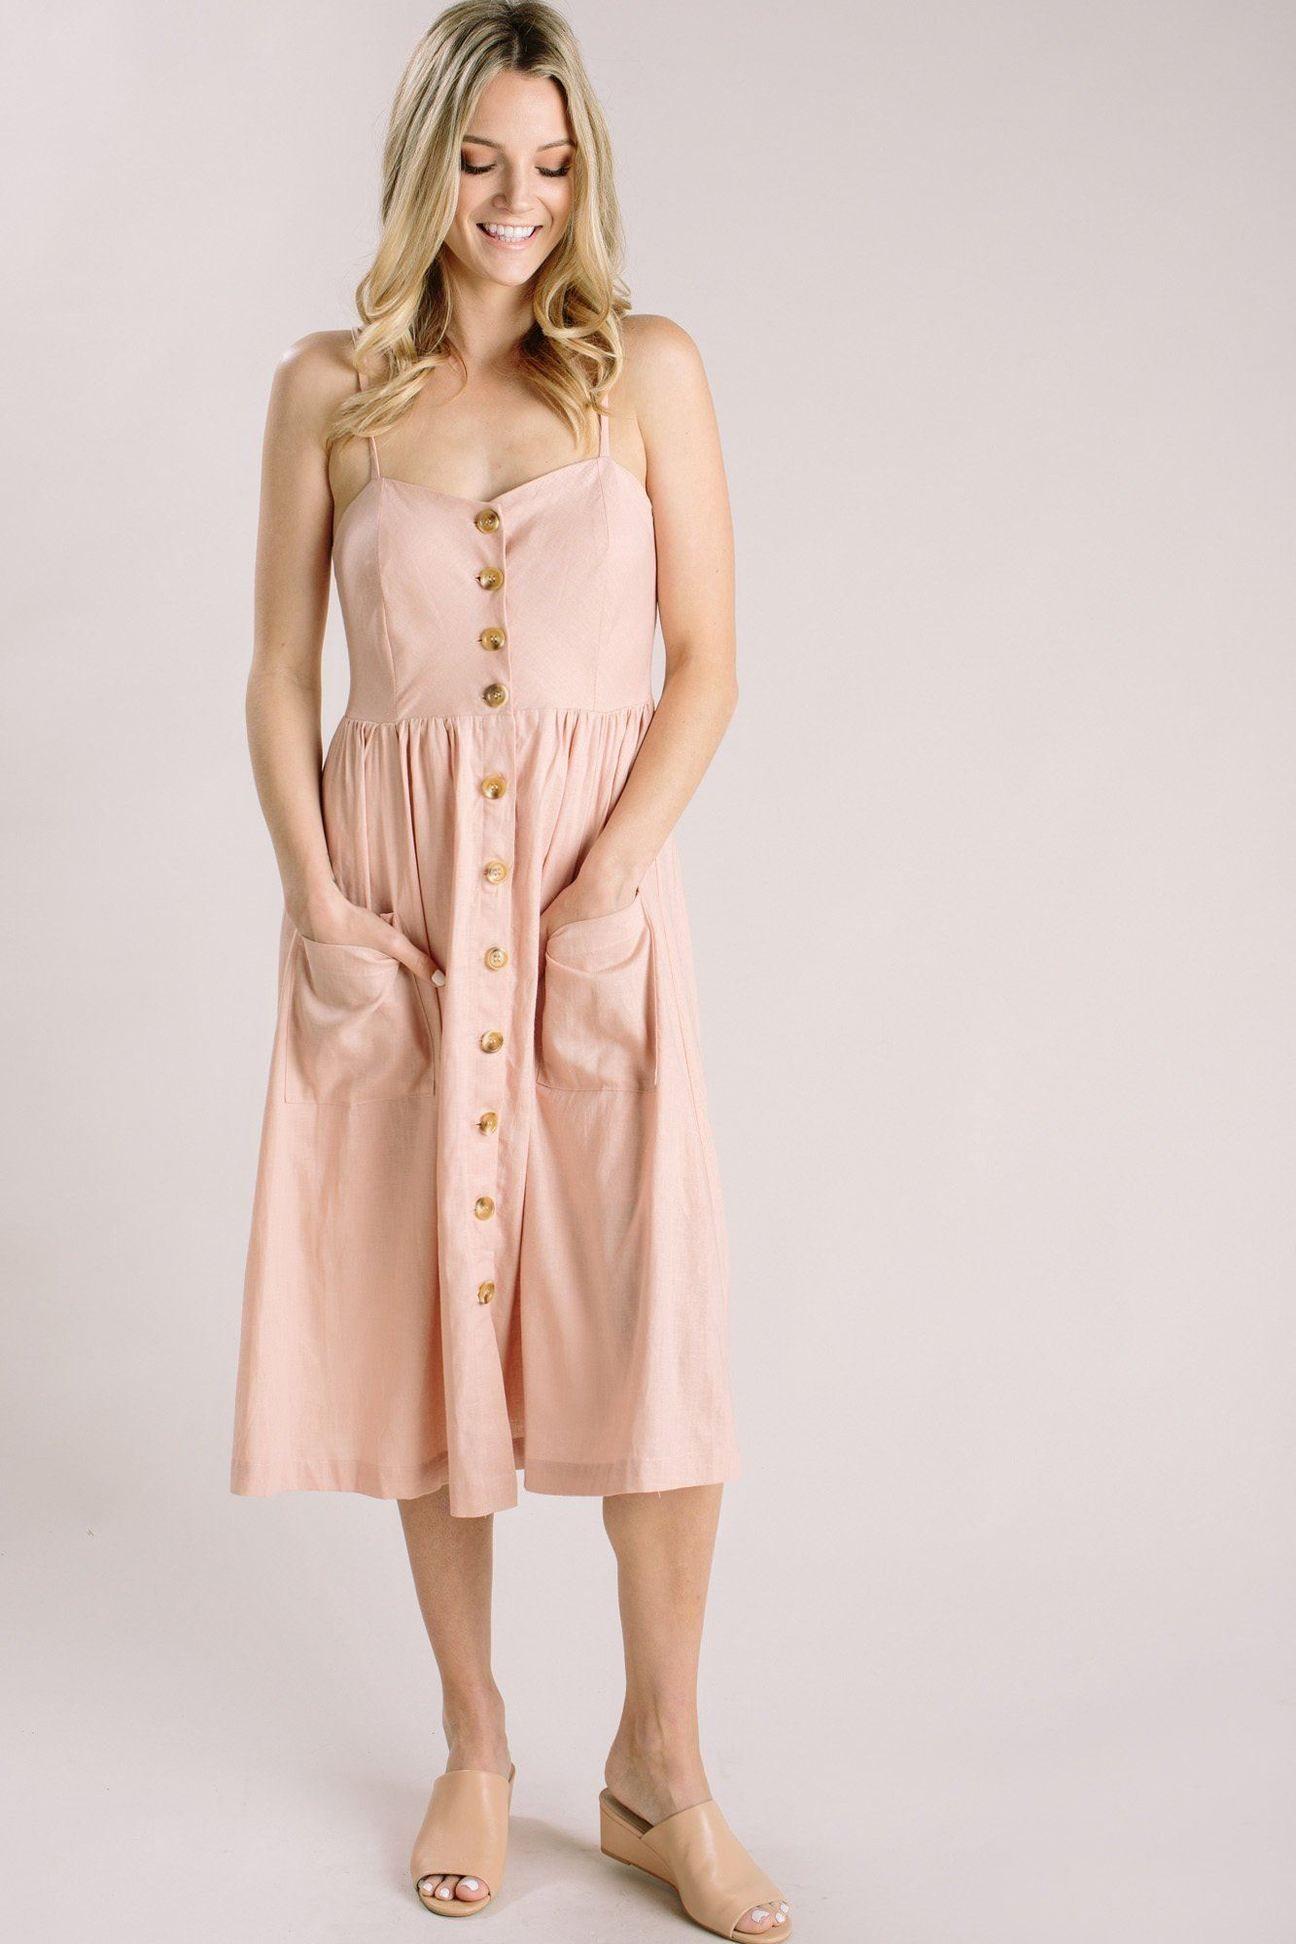 f87d0533a86 Shop the Roxanne Blush Button Midi Dress - boutique clothing featuring  fresh